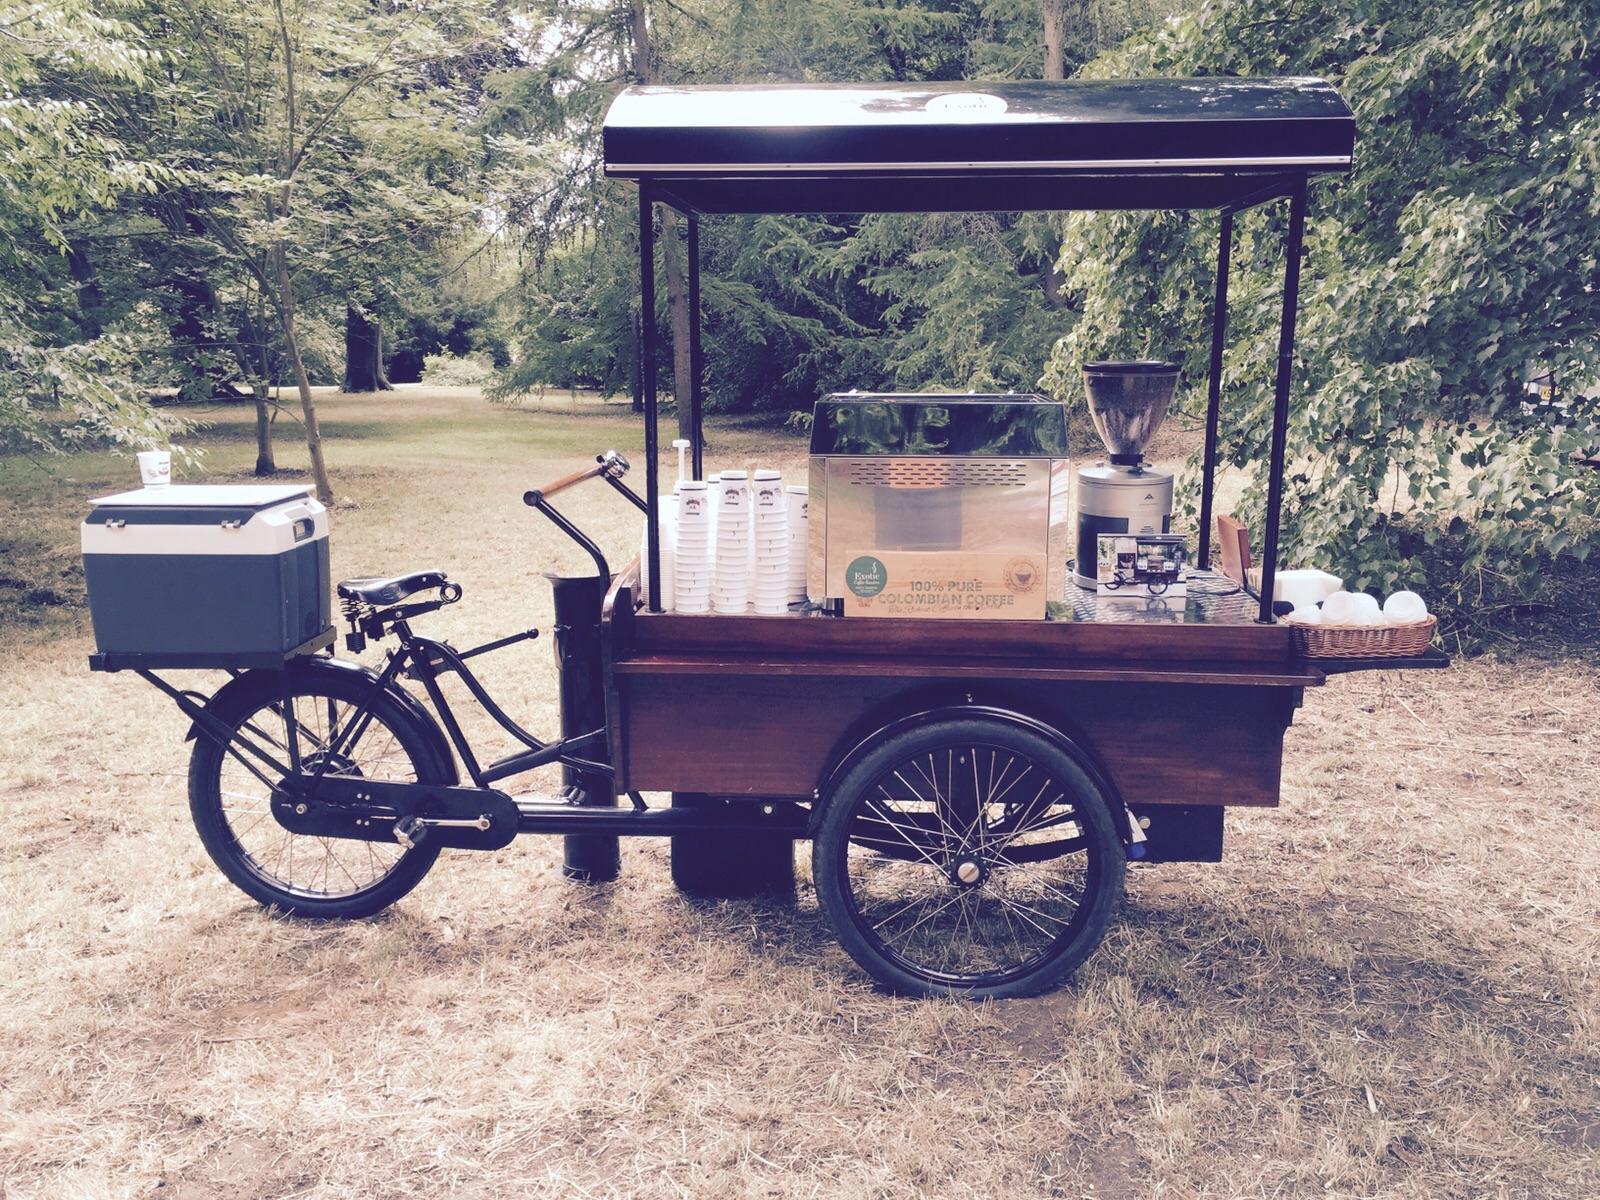 Exotic Coffee 'carrito'